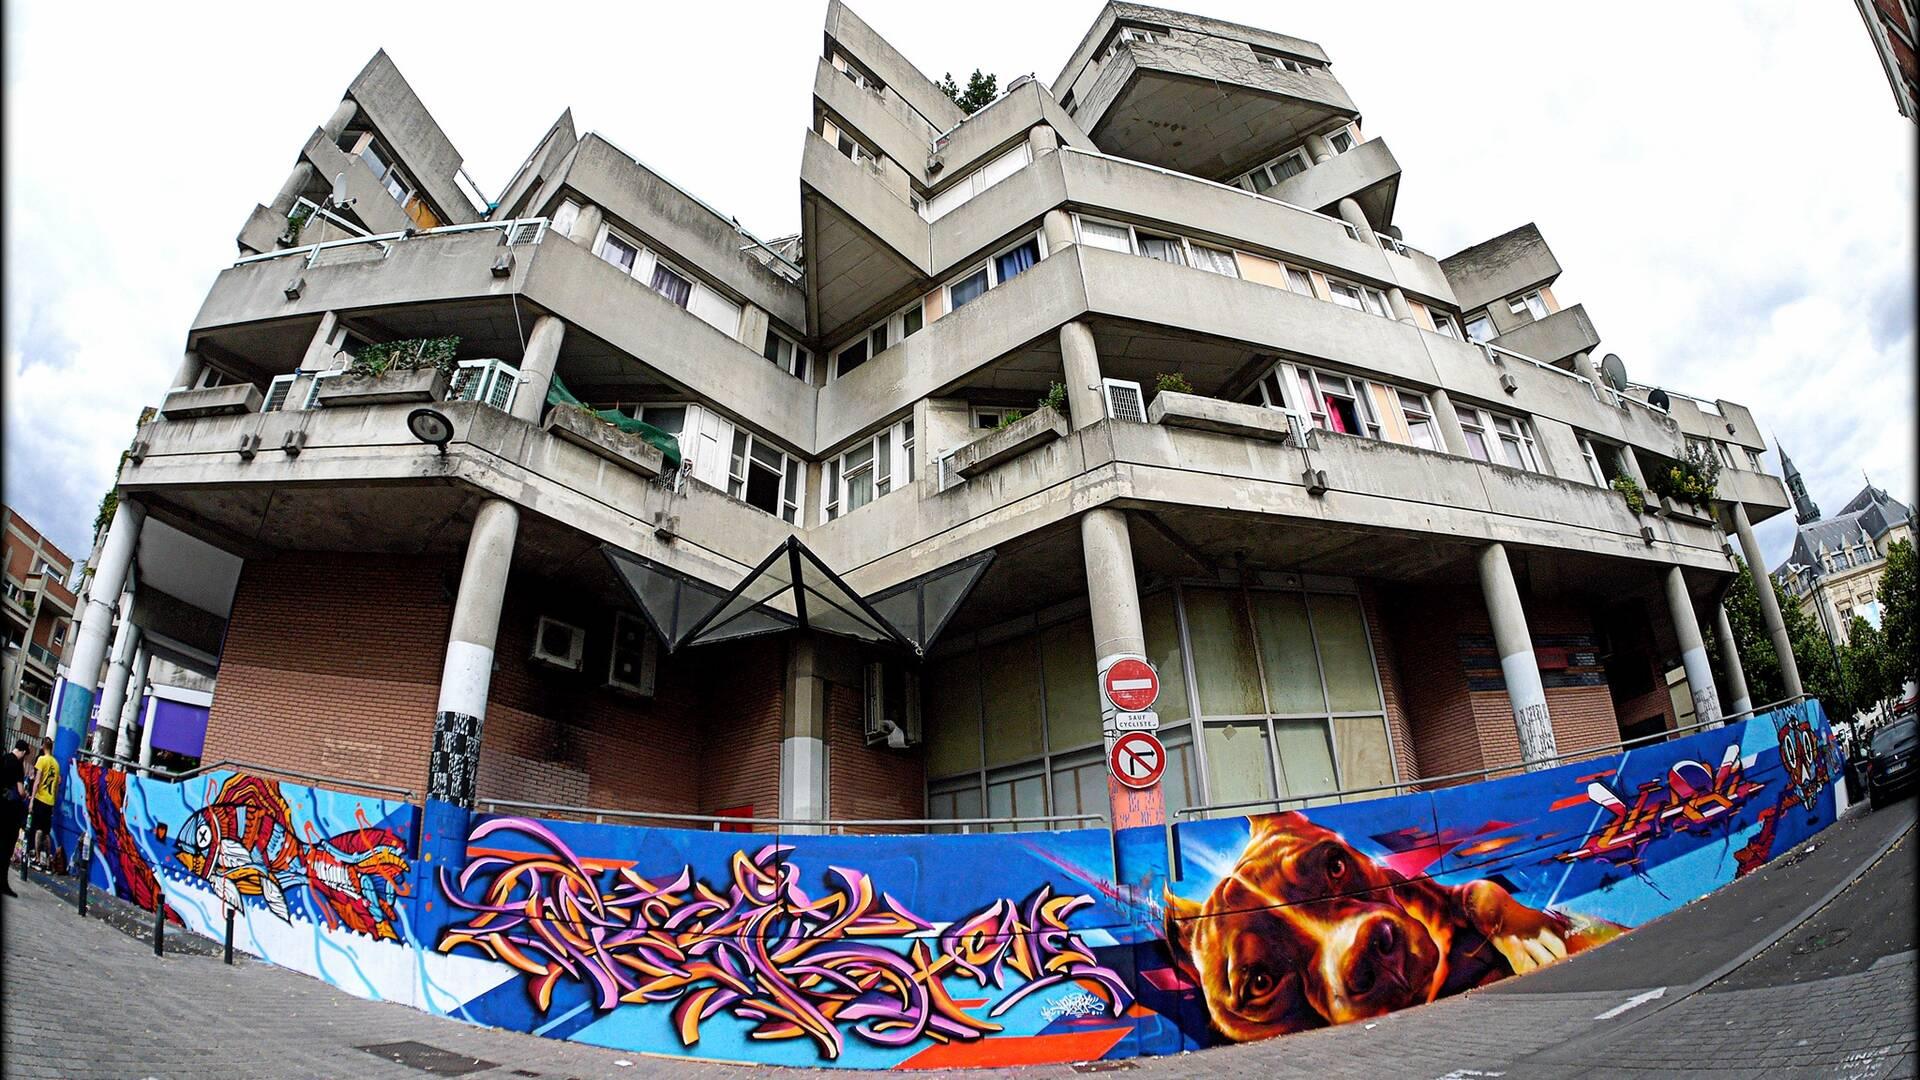 eaj2323-moyoshi-weis-urbain-lord-mur-93-street-art-saint-denis-plaine-commune-grand-paris-nord